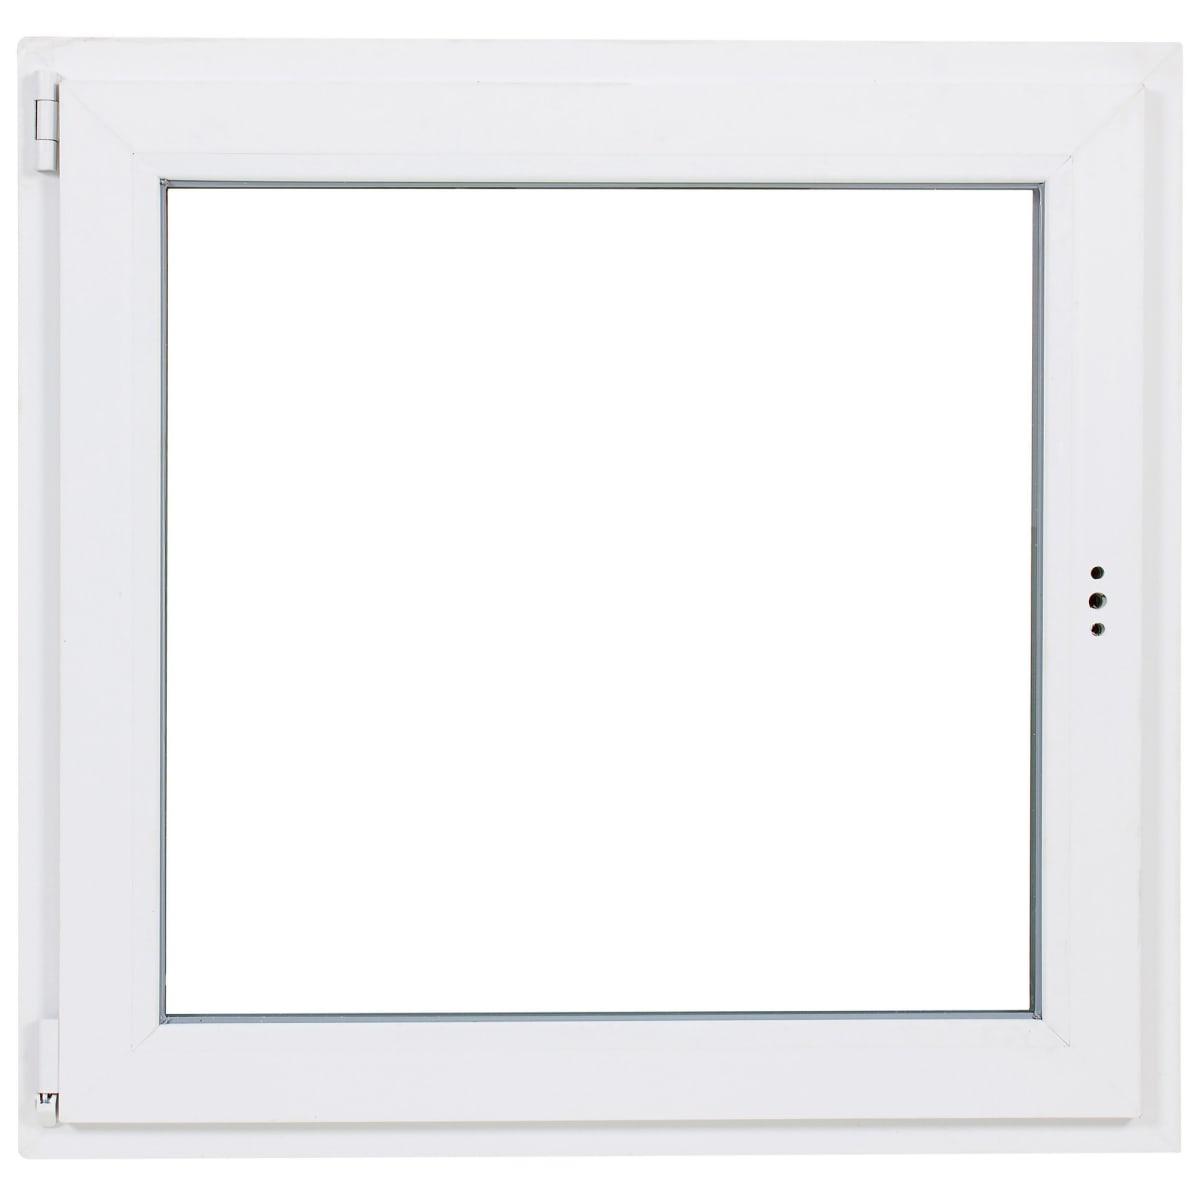 Окно ПВХ одностворчатое 90(87)х90 см поворотно-откидное левое